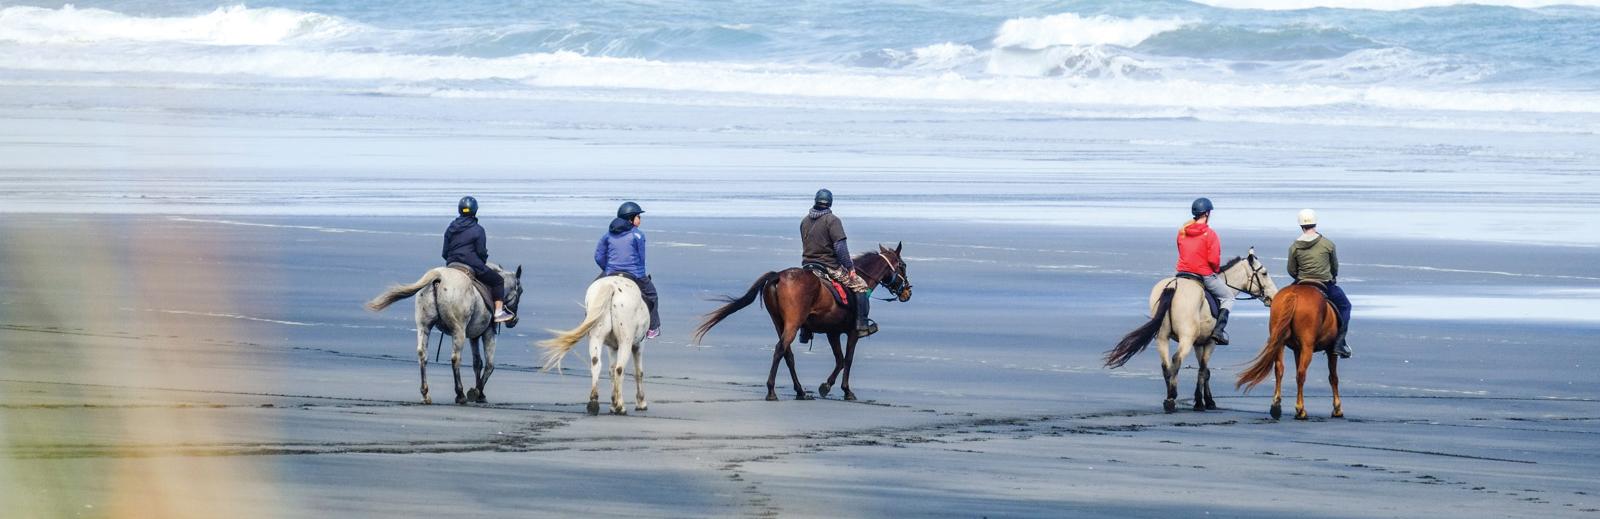 Wildcoast Ruapuke Horse Adventures  and Cabins